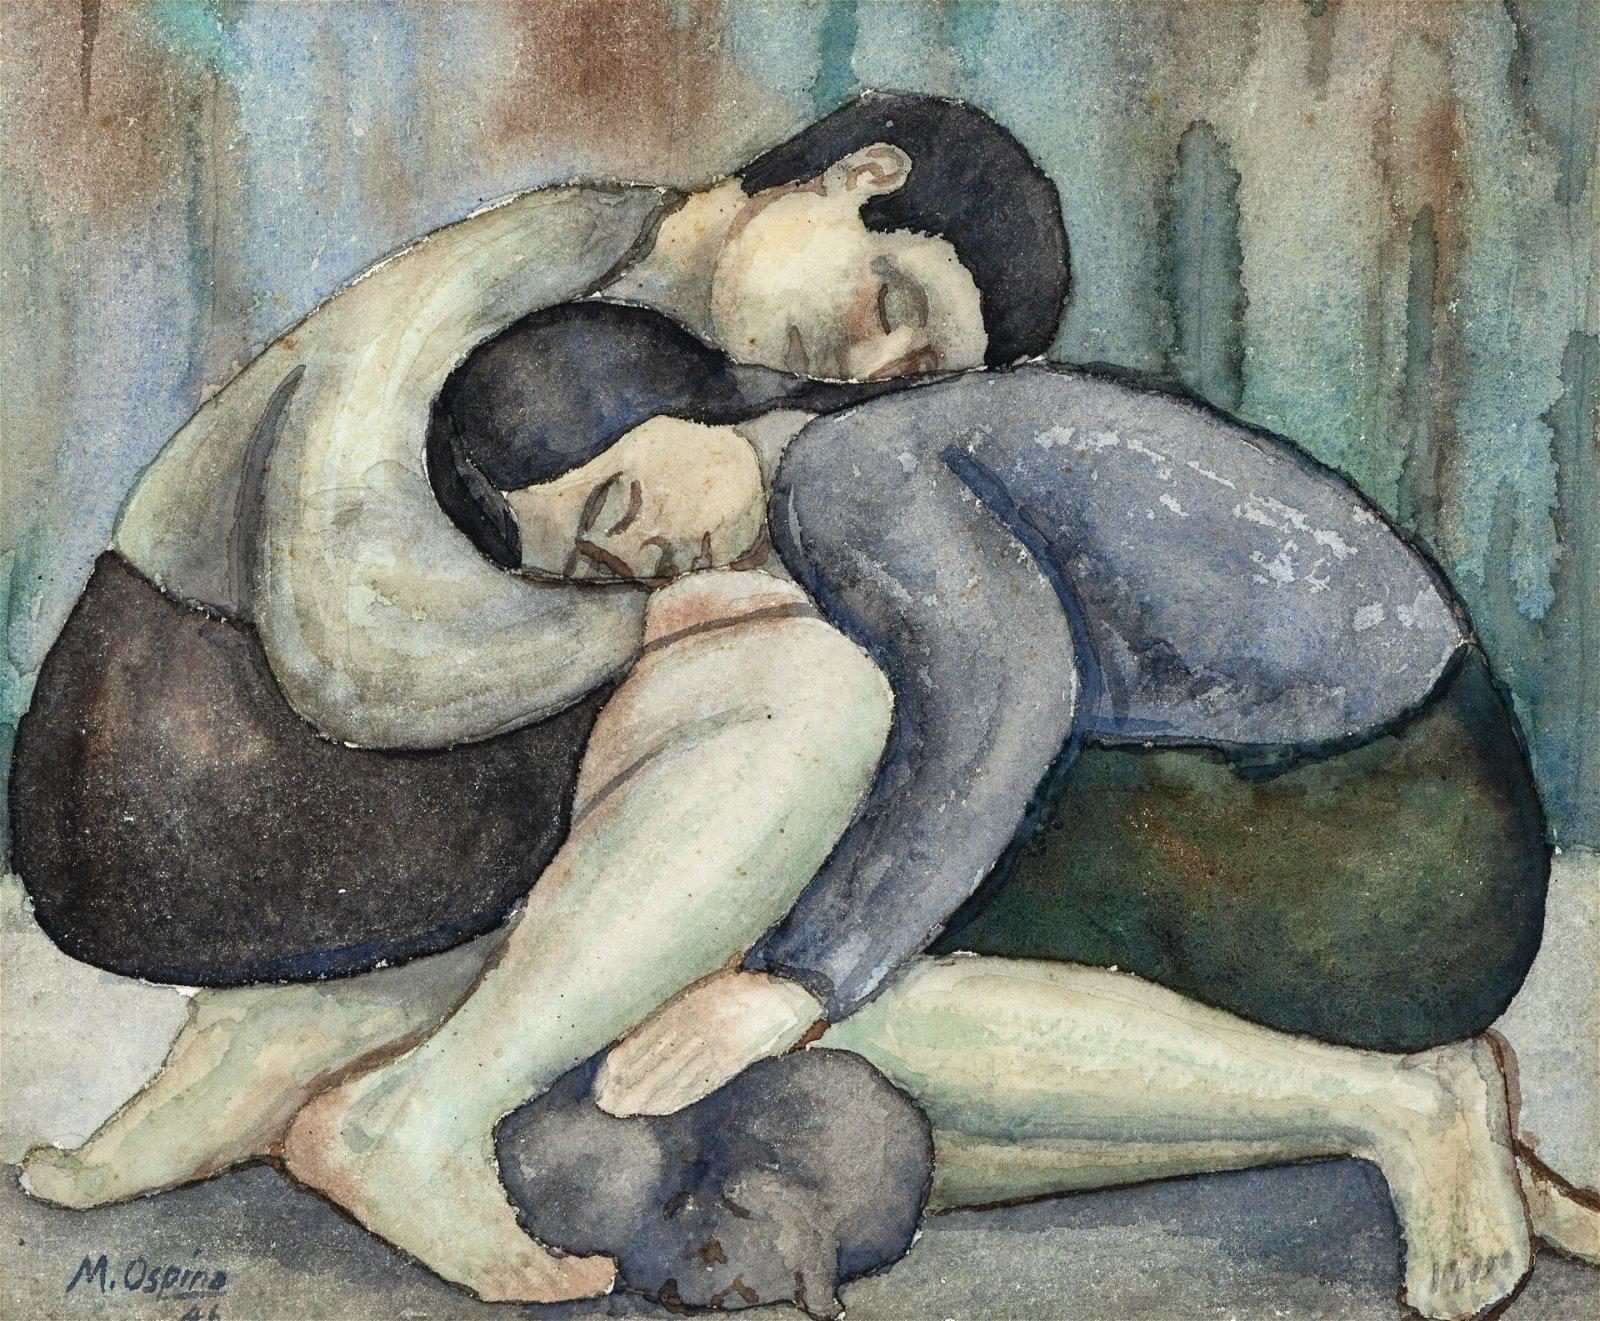 Ospina Marco, [Sueño], 1946